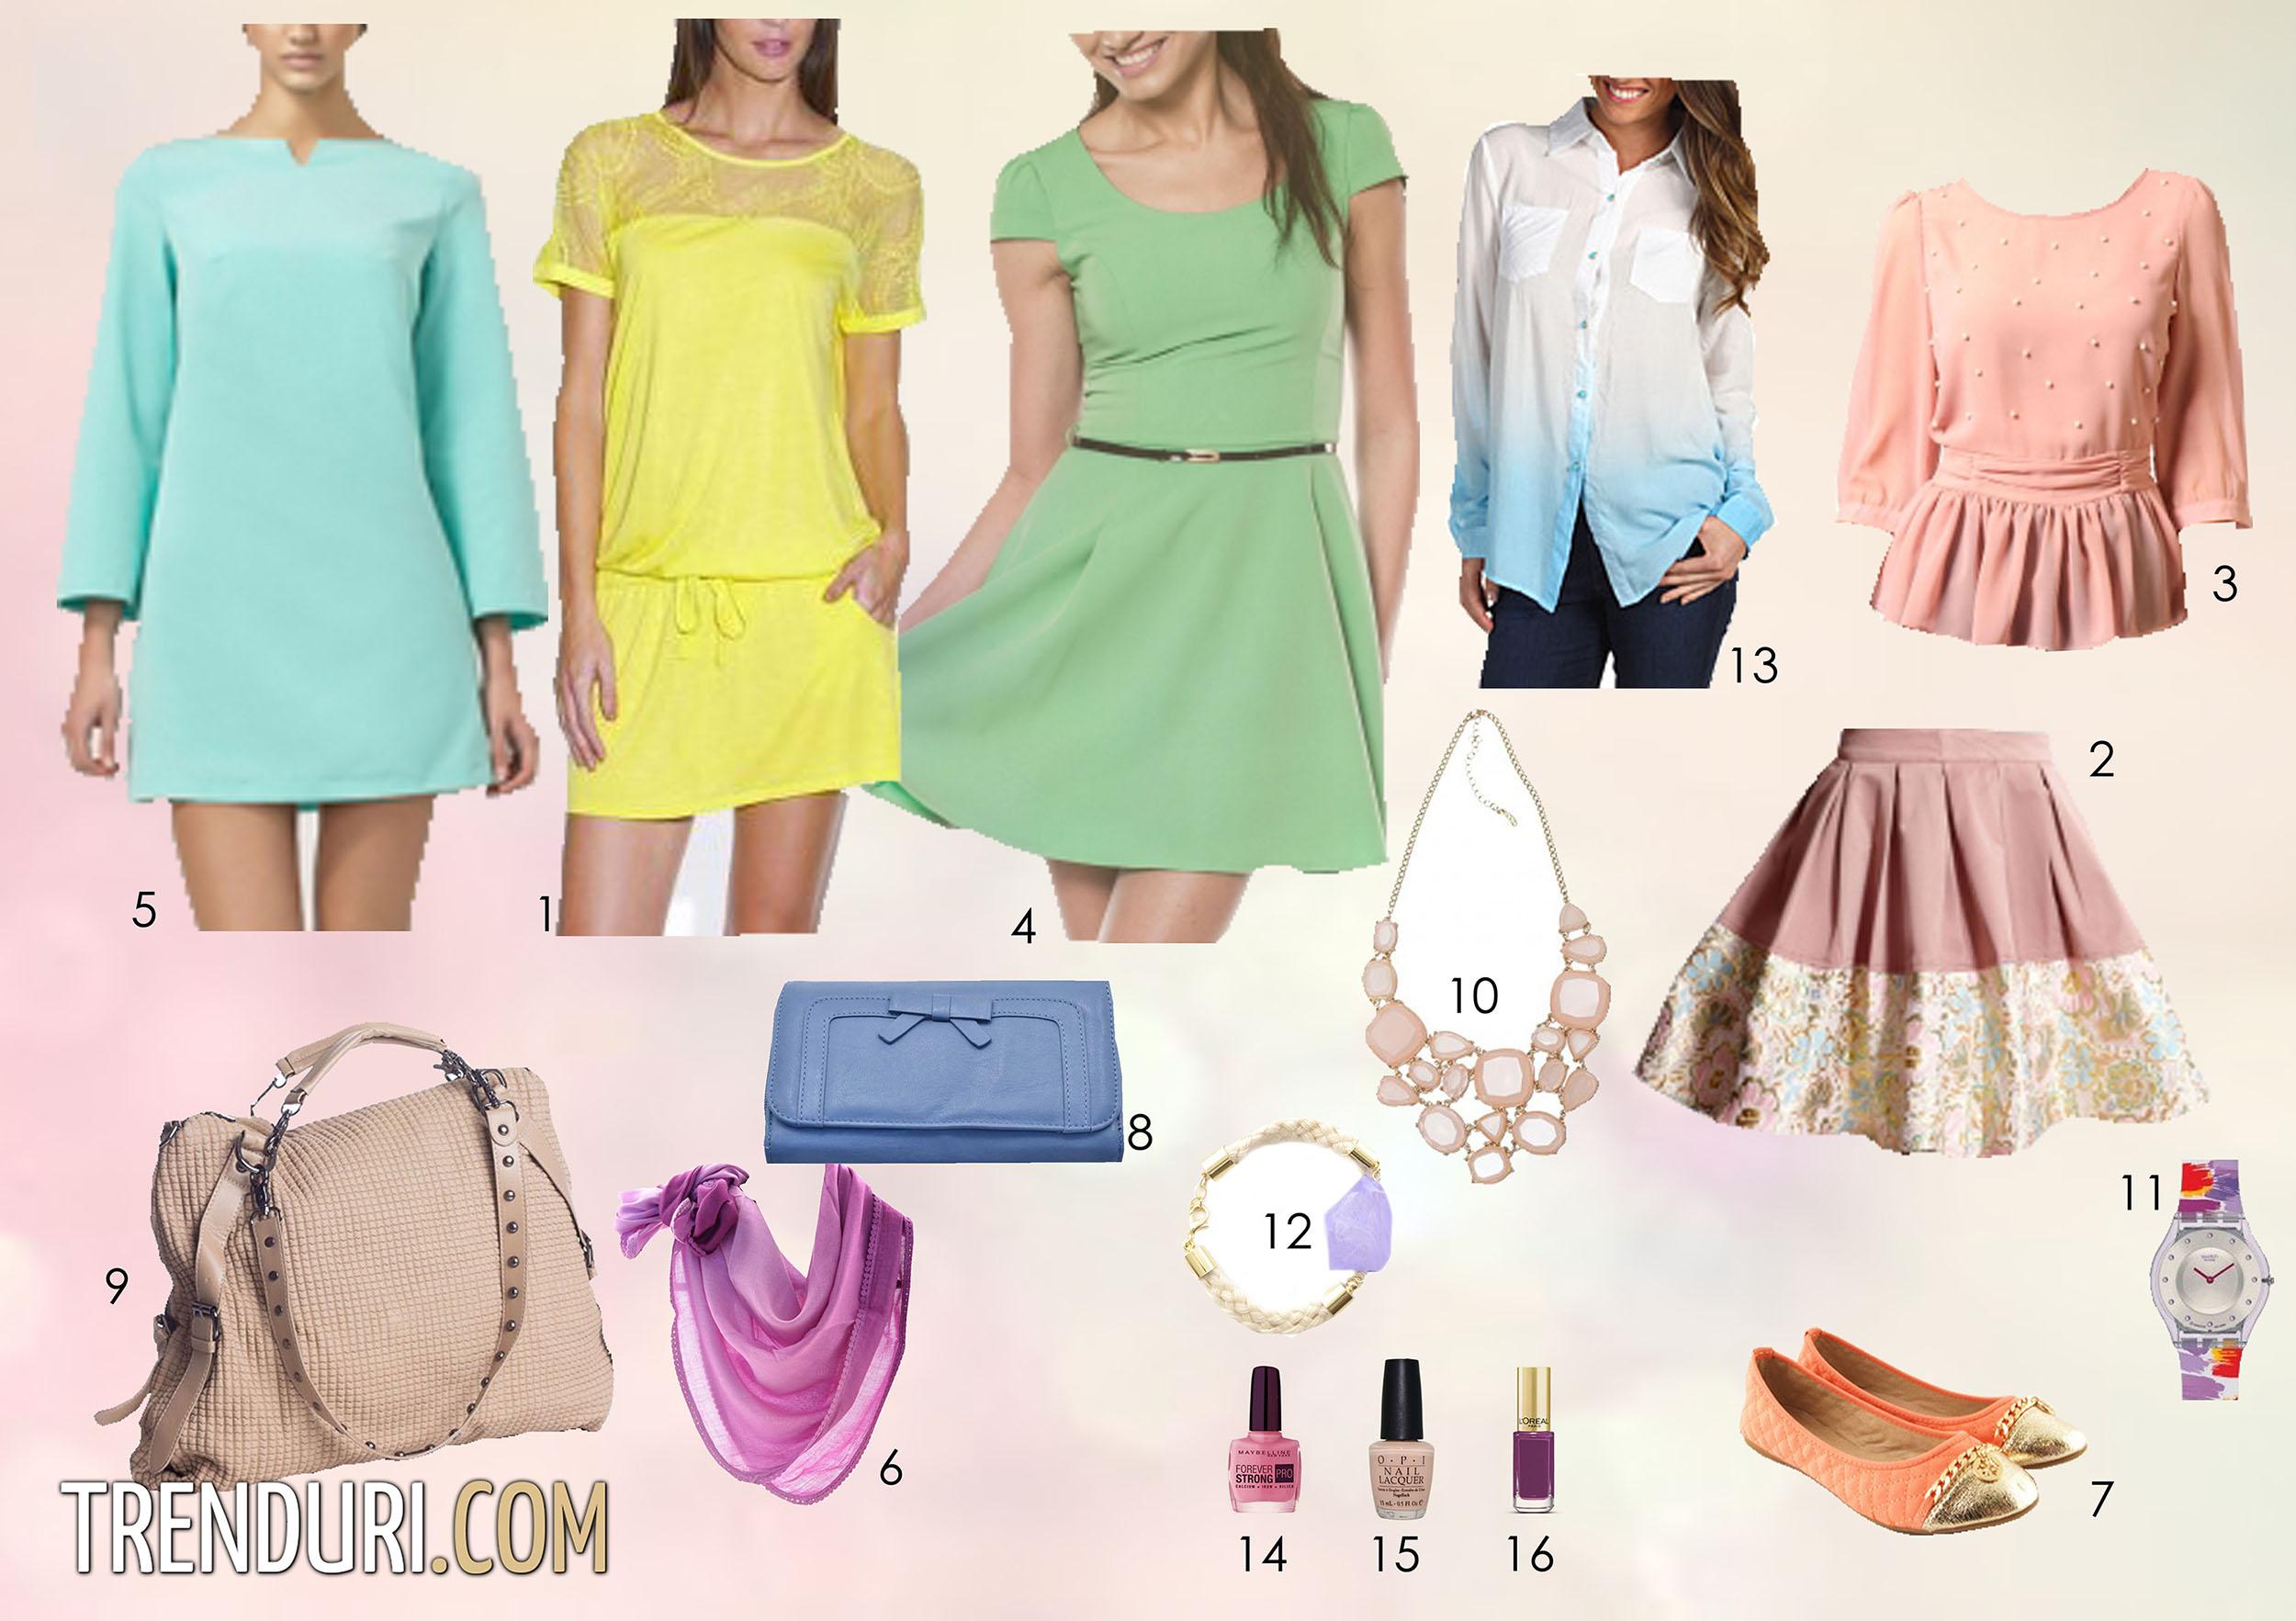 culori-pastelate-haine-2013